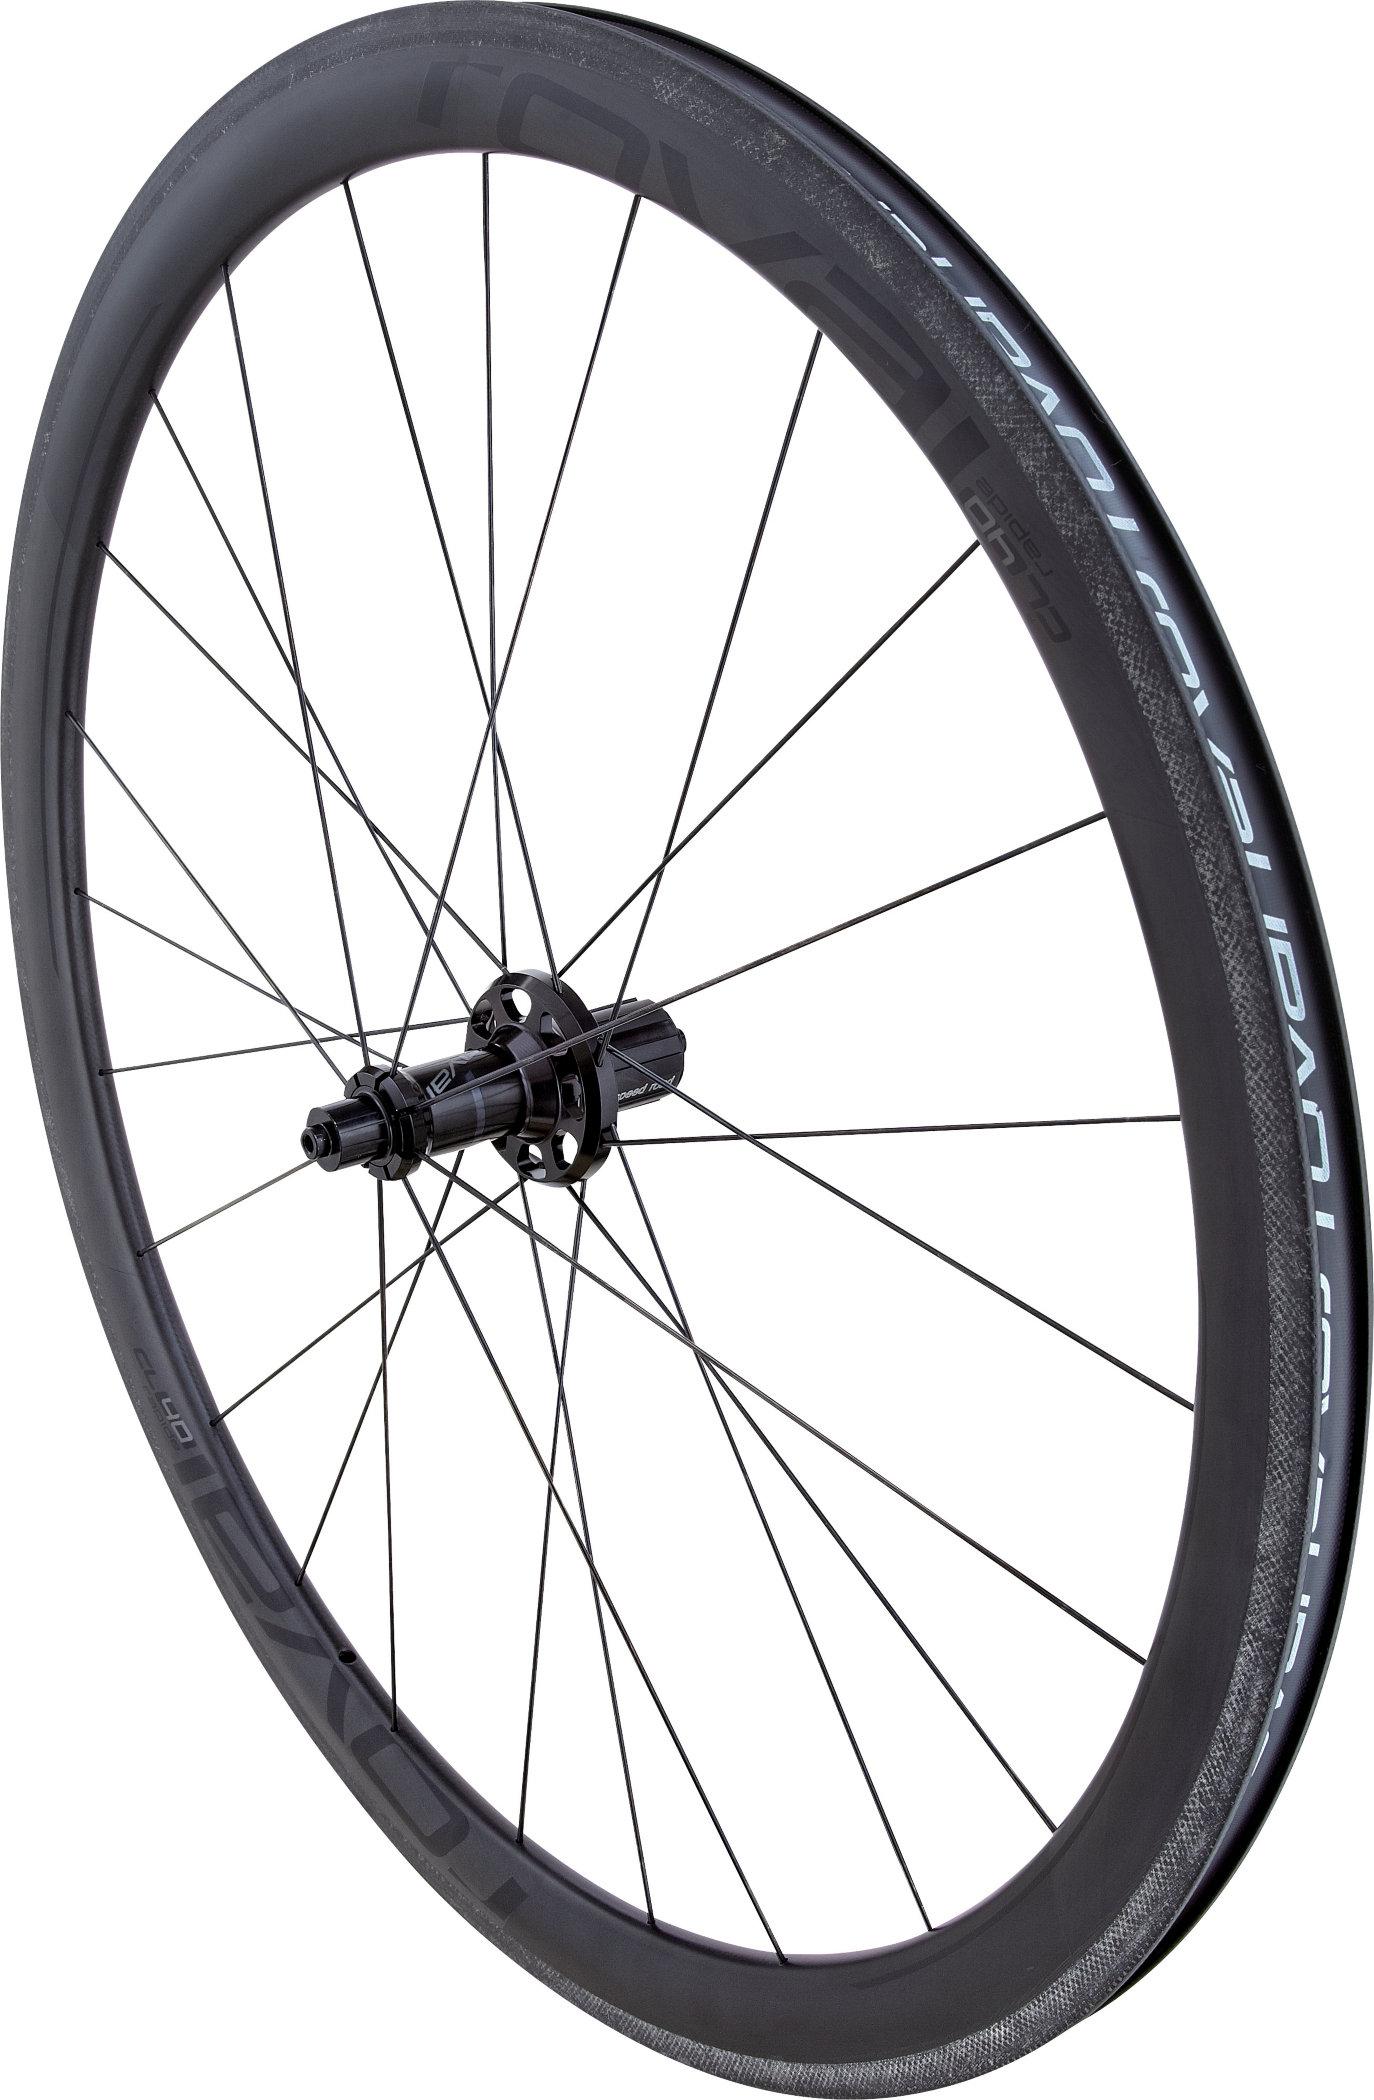 SPECIALIZED CL 40 REAR SATIN CARBON/BLK - Bike Zone